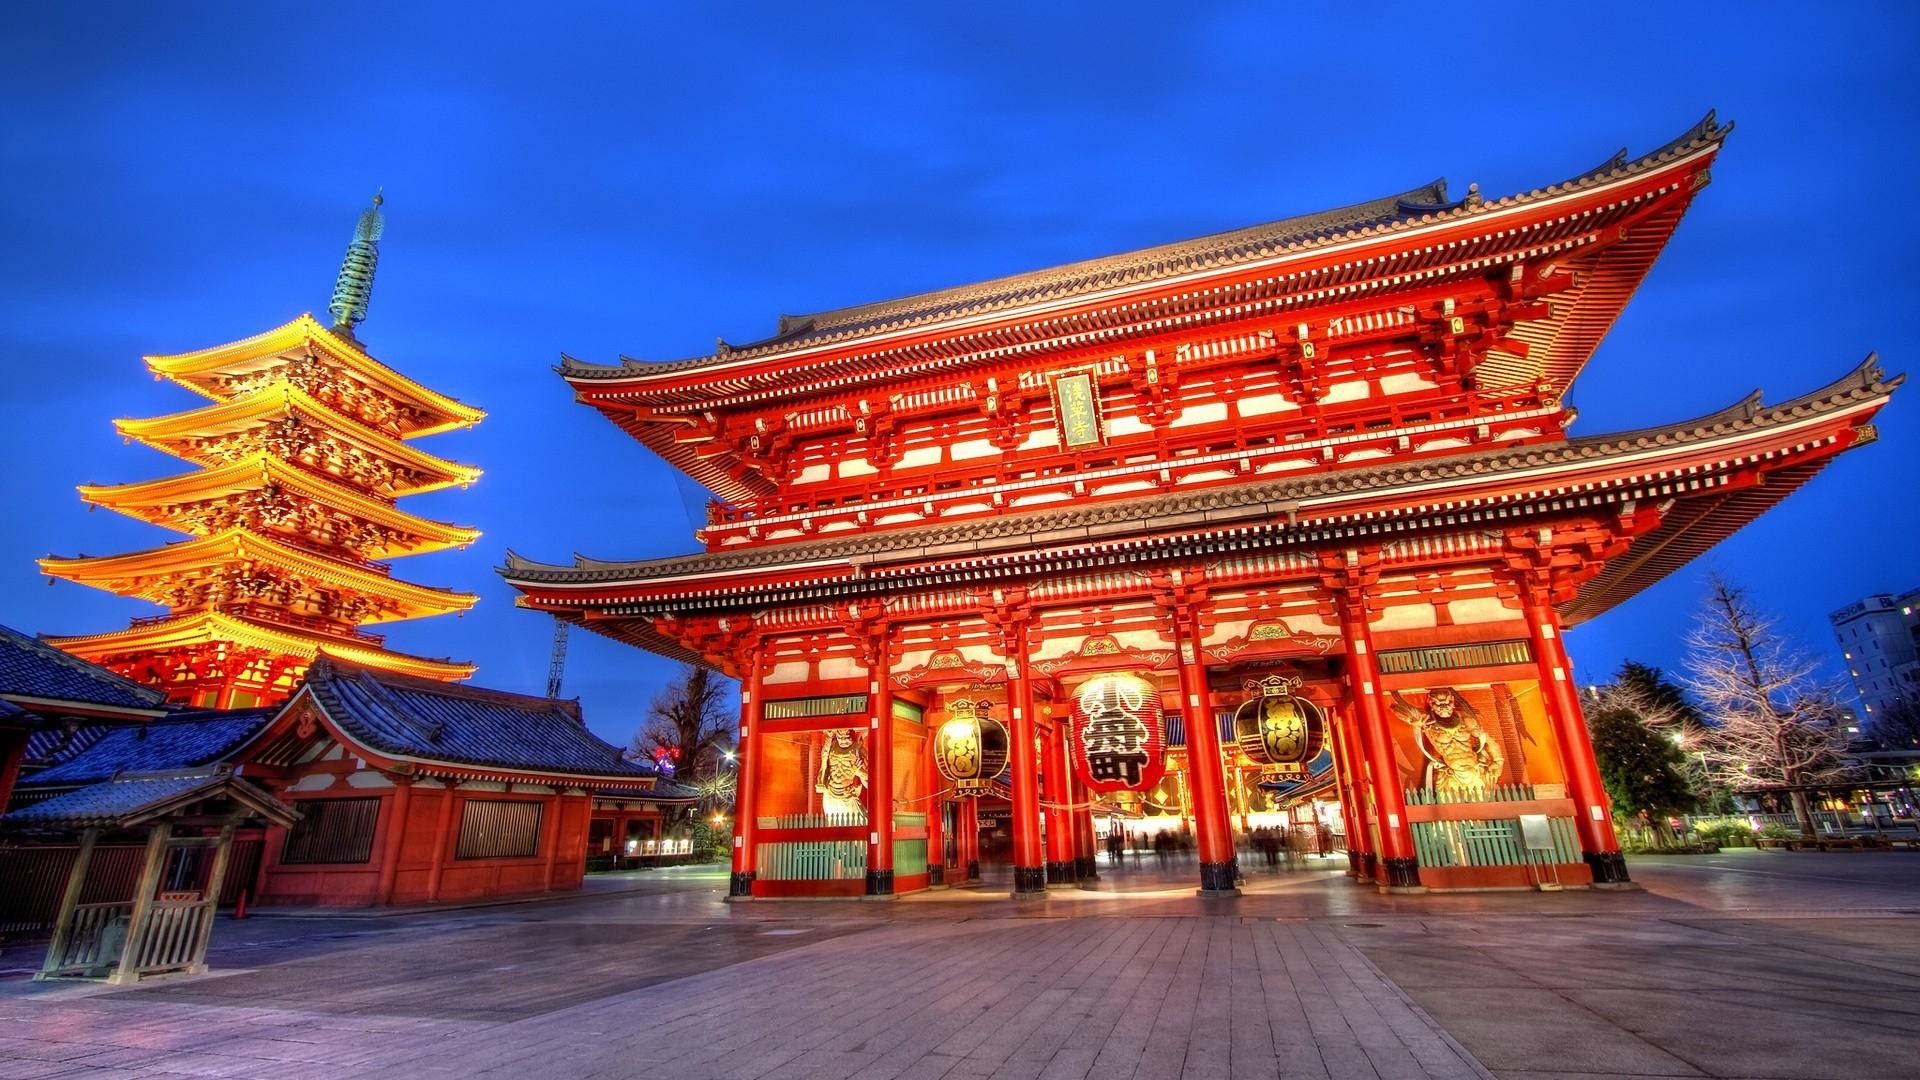 du lịch nhật bản - đền Asakusa Kannon